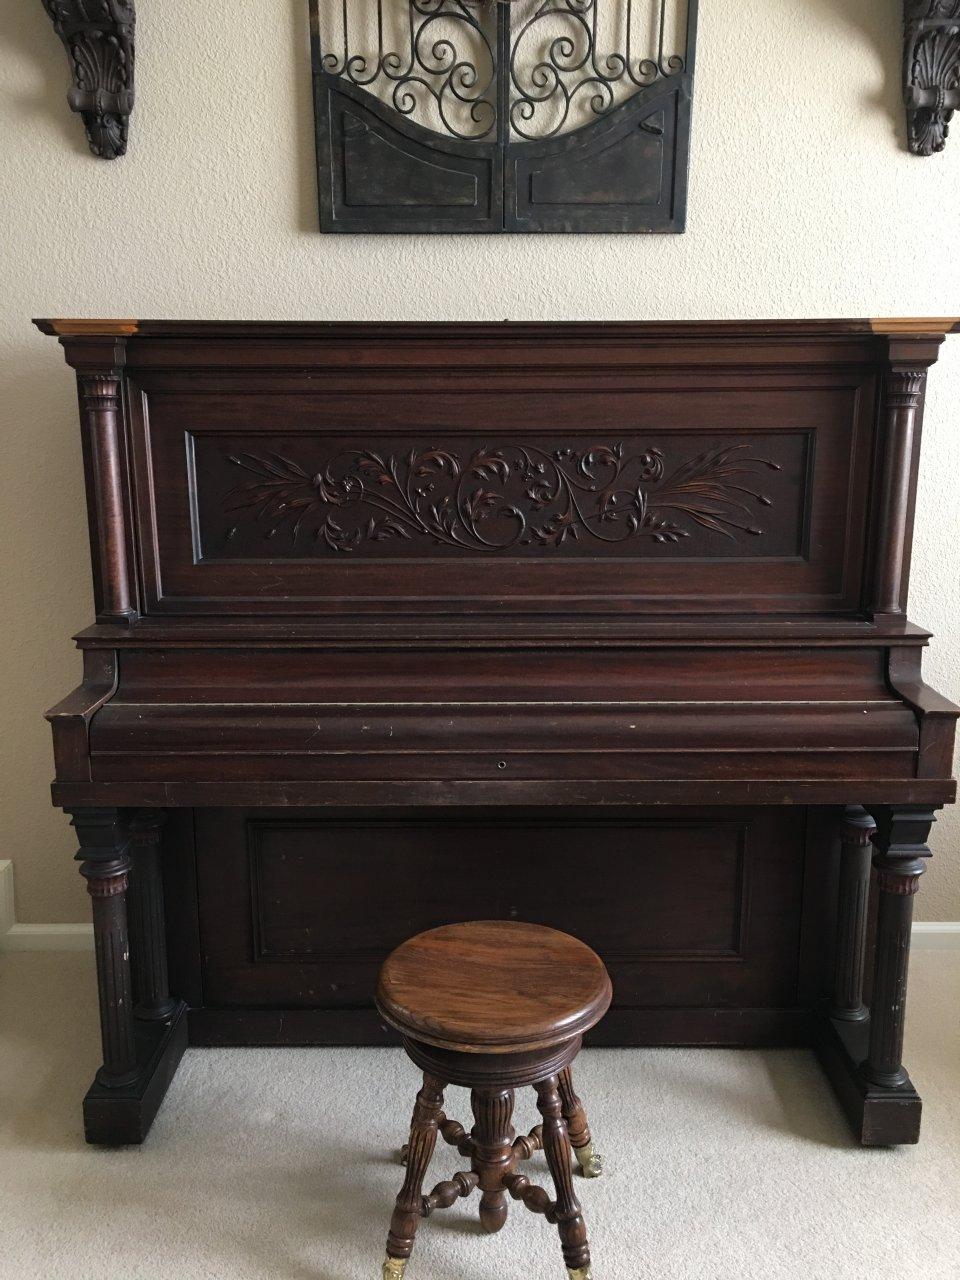 Cable midget piano